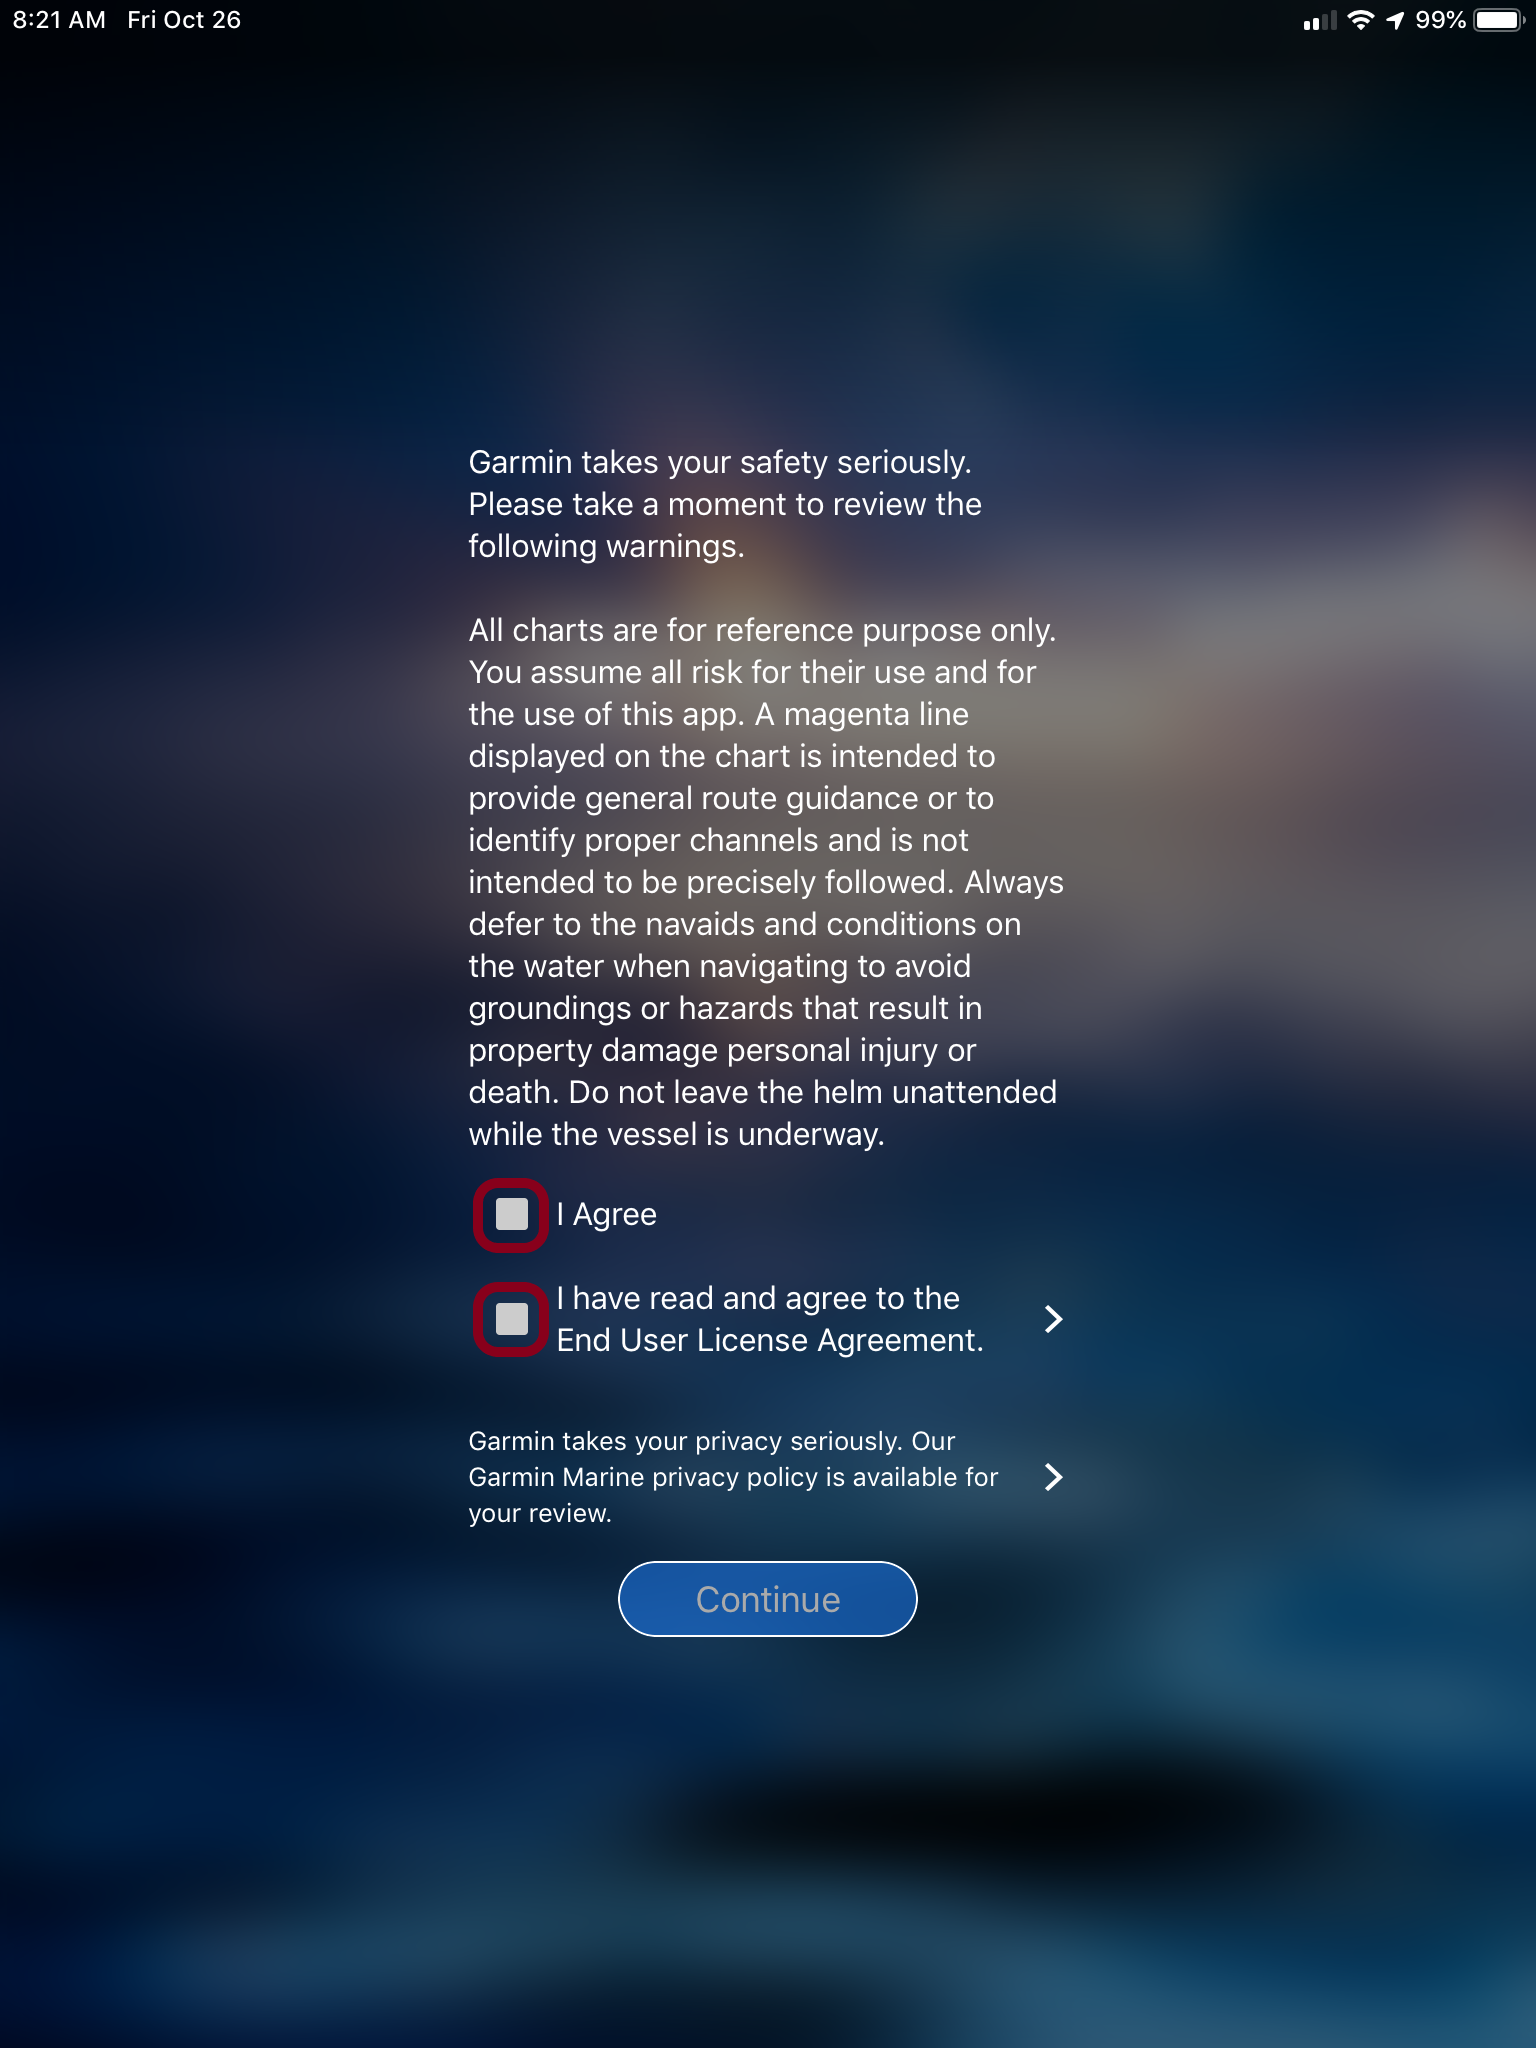 Registering a Garmin Marine Device Using the ActiveCaptain